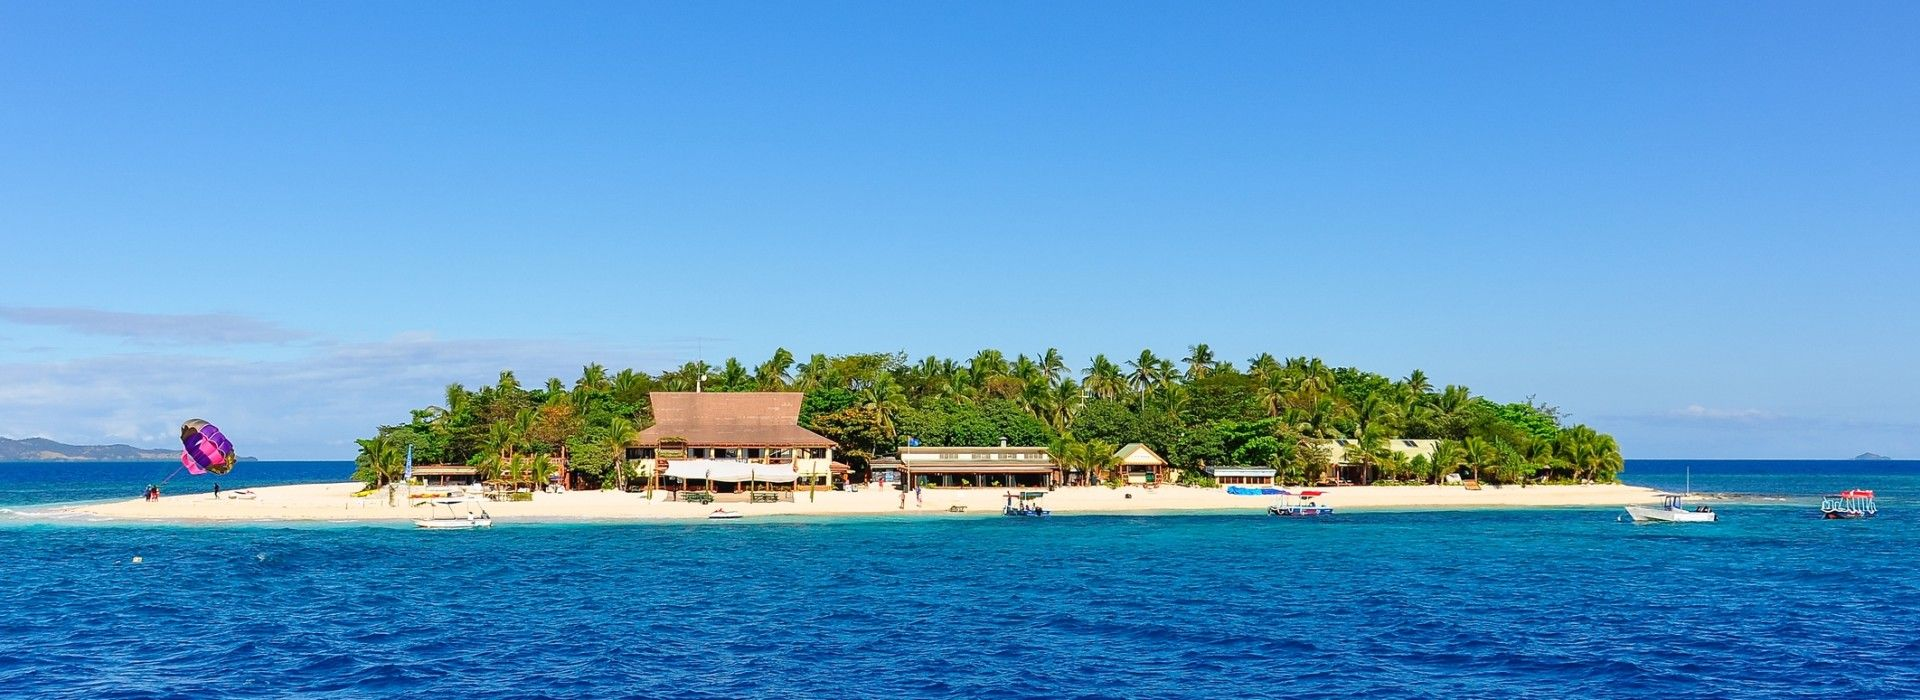 Snorkeling Tours in Oceania